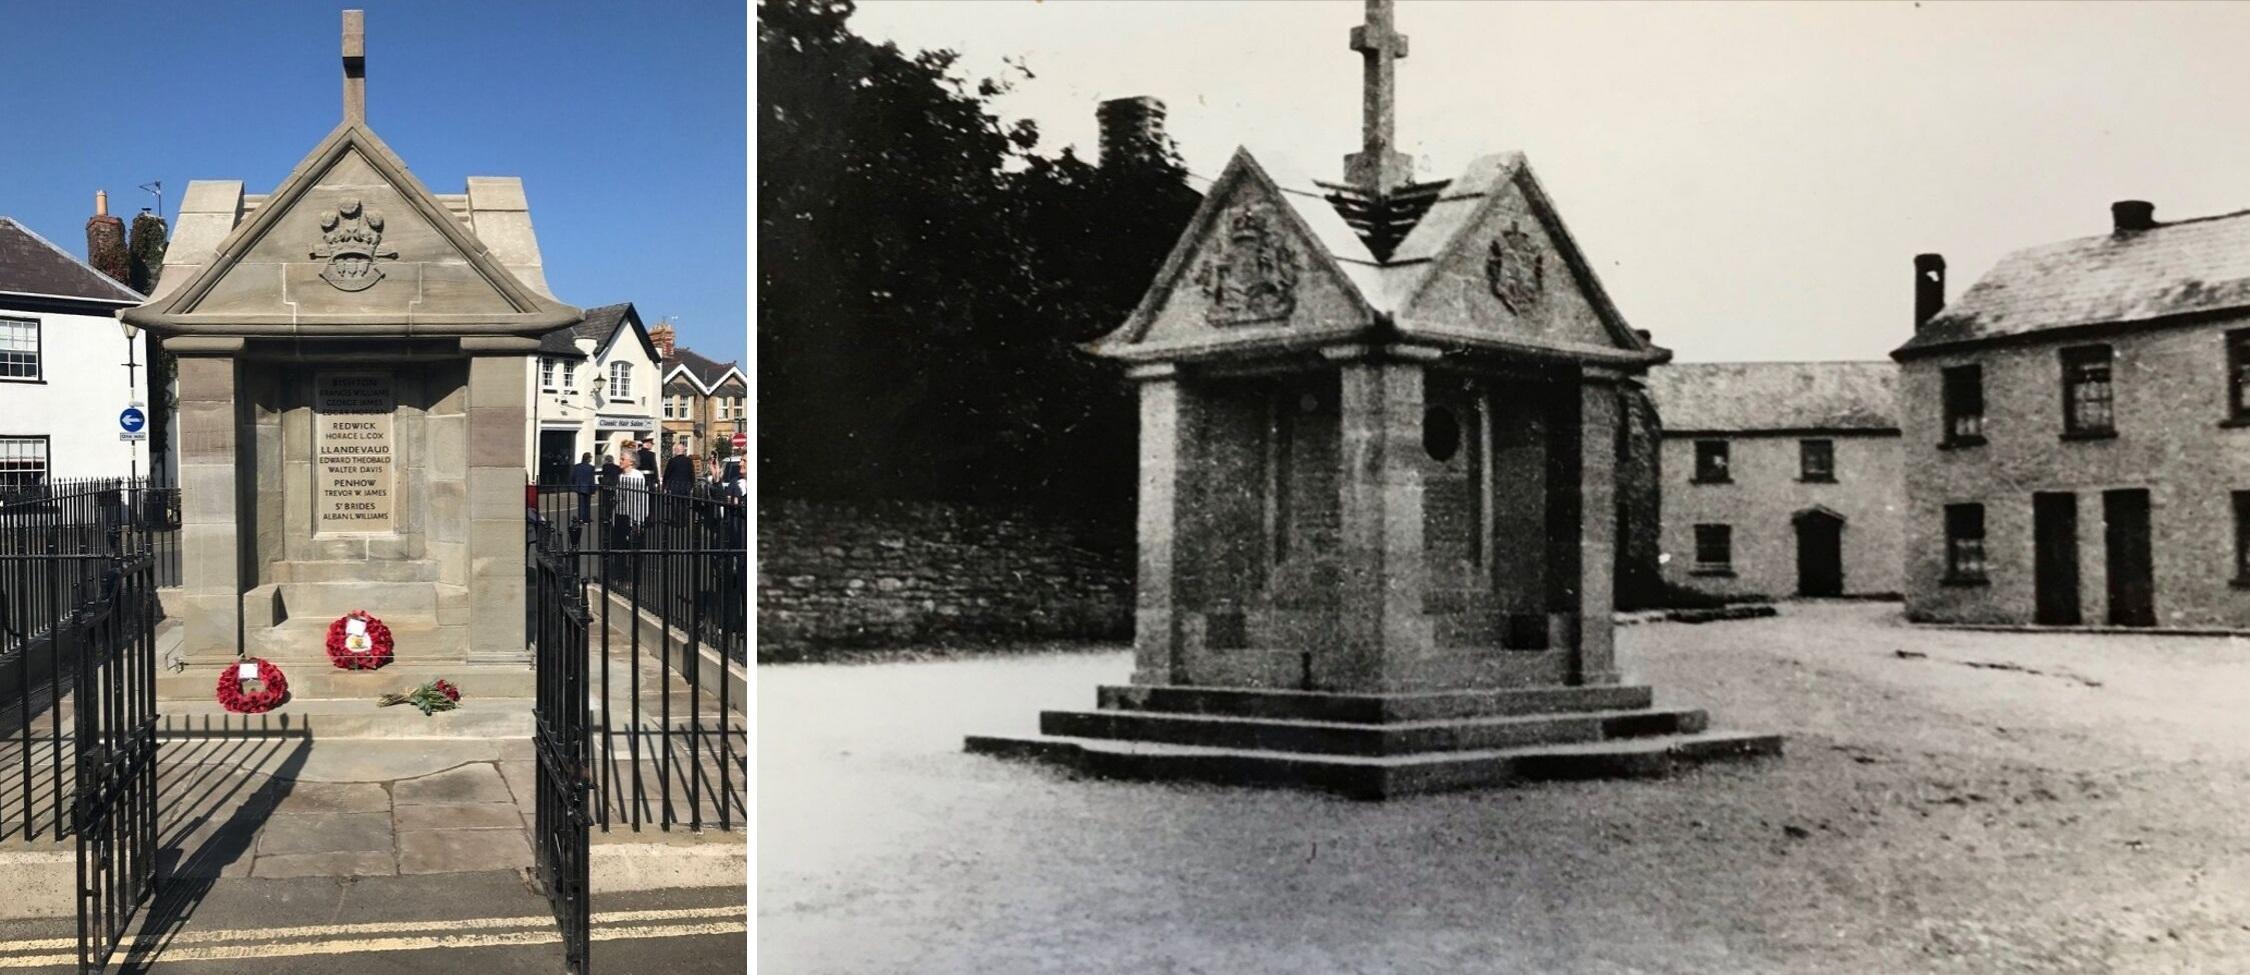 Service marks rededication of war memorial in village